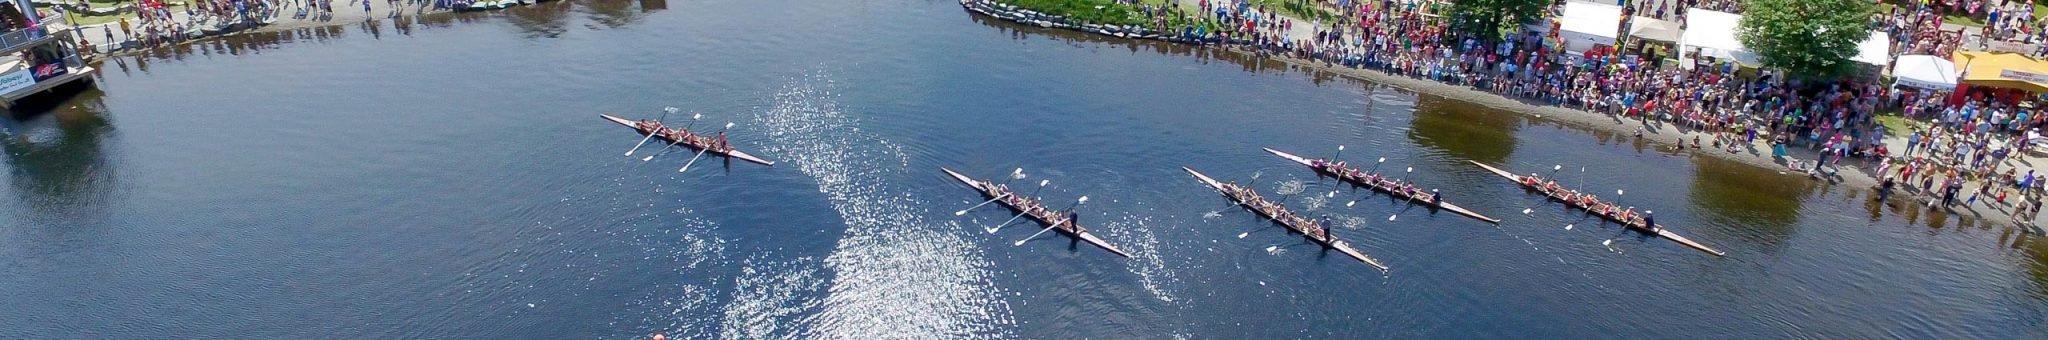 Royal St. John's Regatta Day Rowing Turn